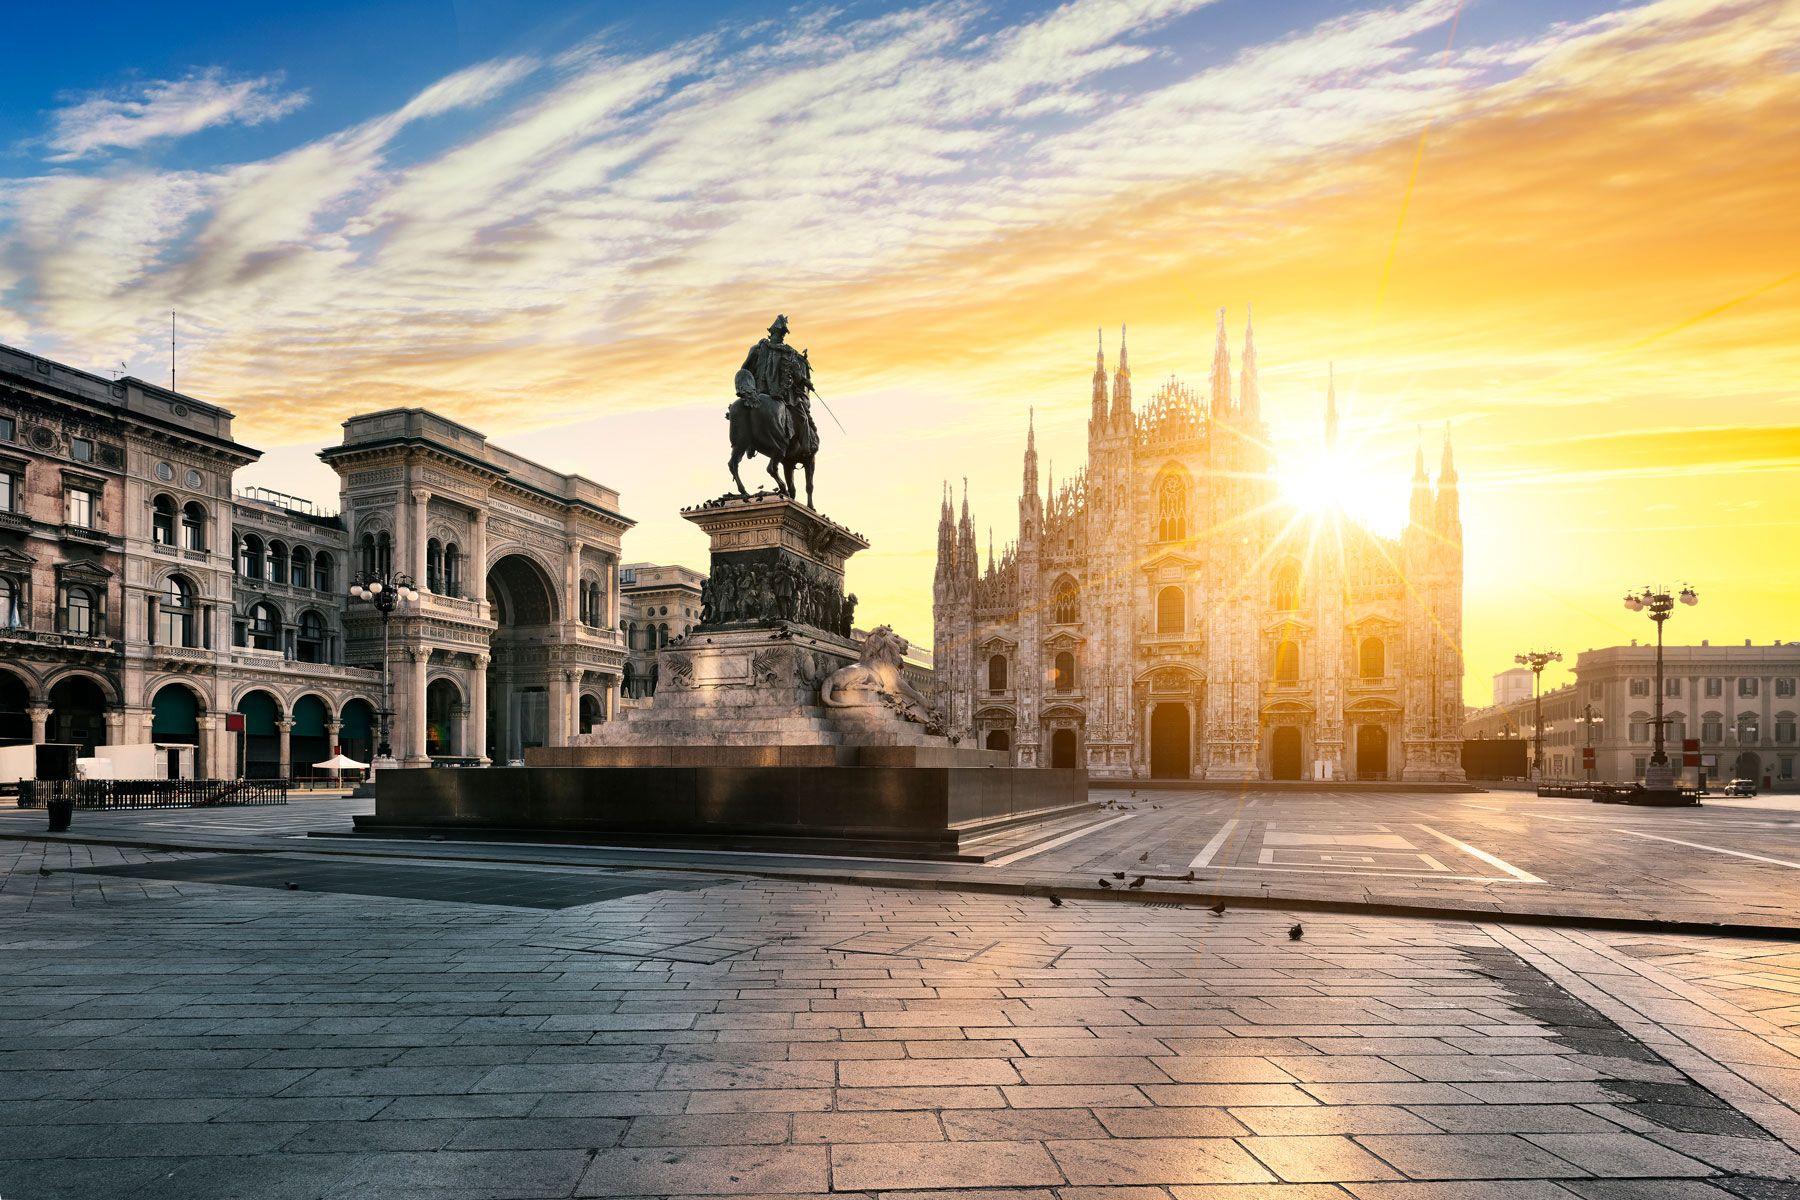 Mailand iStock528059198 web